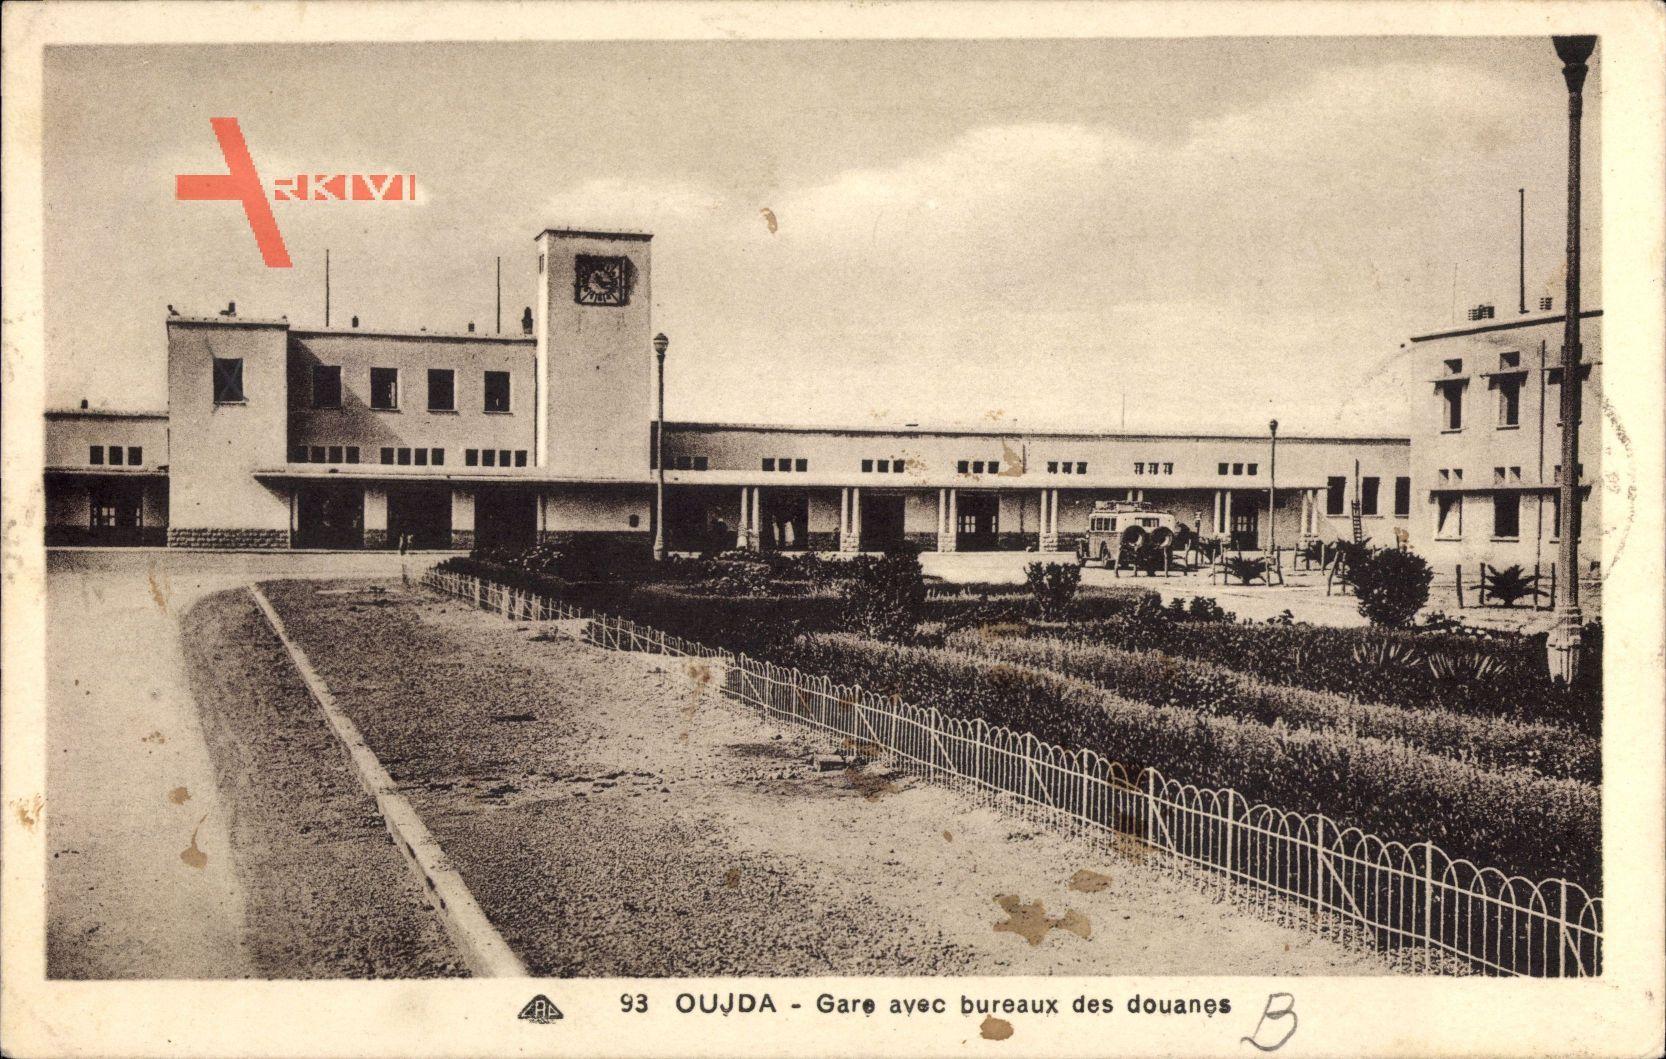 Oudjda oujda marokko gare avec bureaux des douanes bahnhof zoll